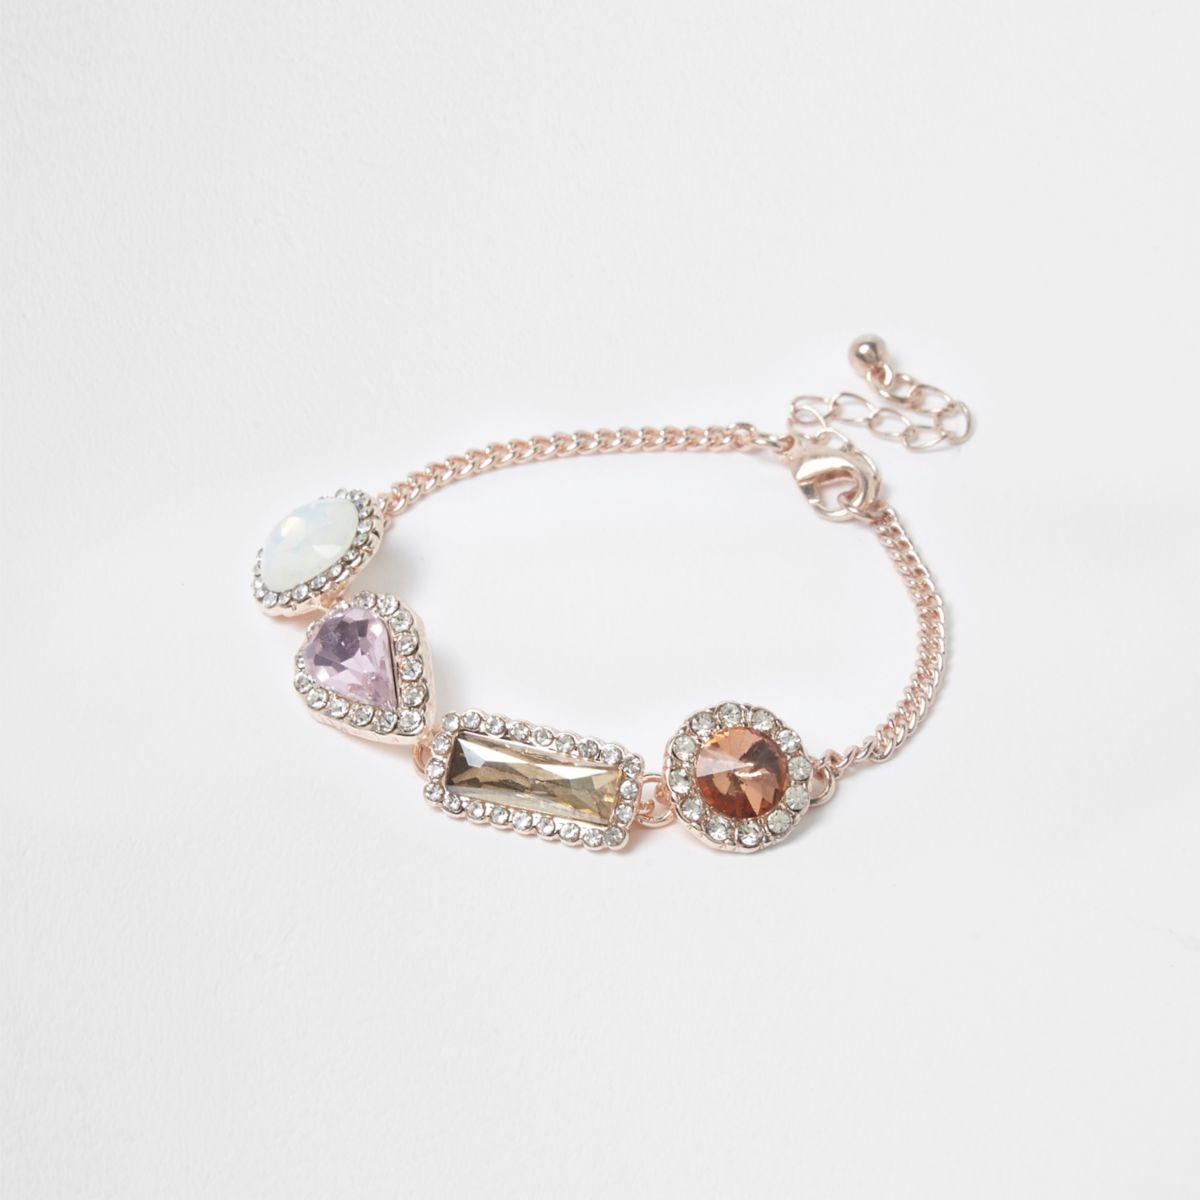 Rose gold tone gem stone bracelet